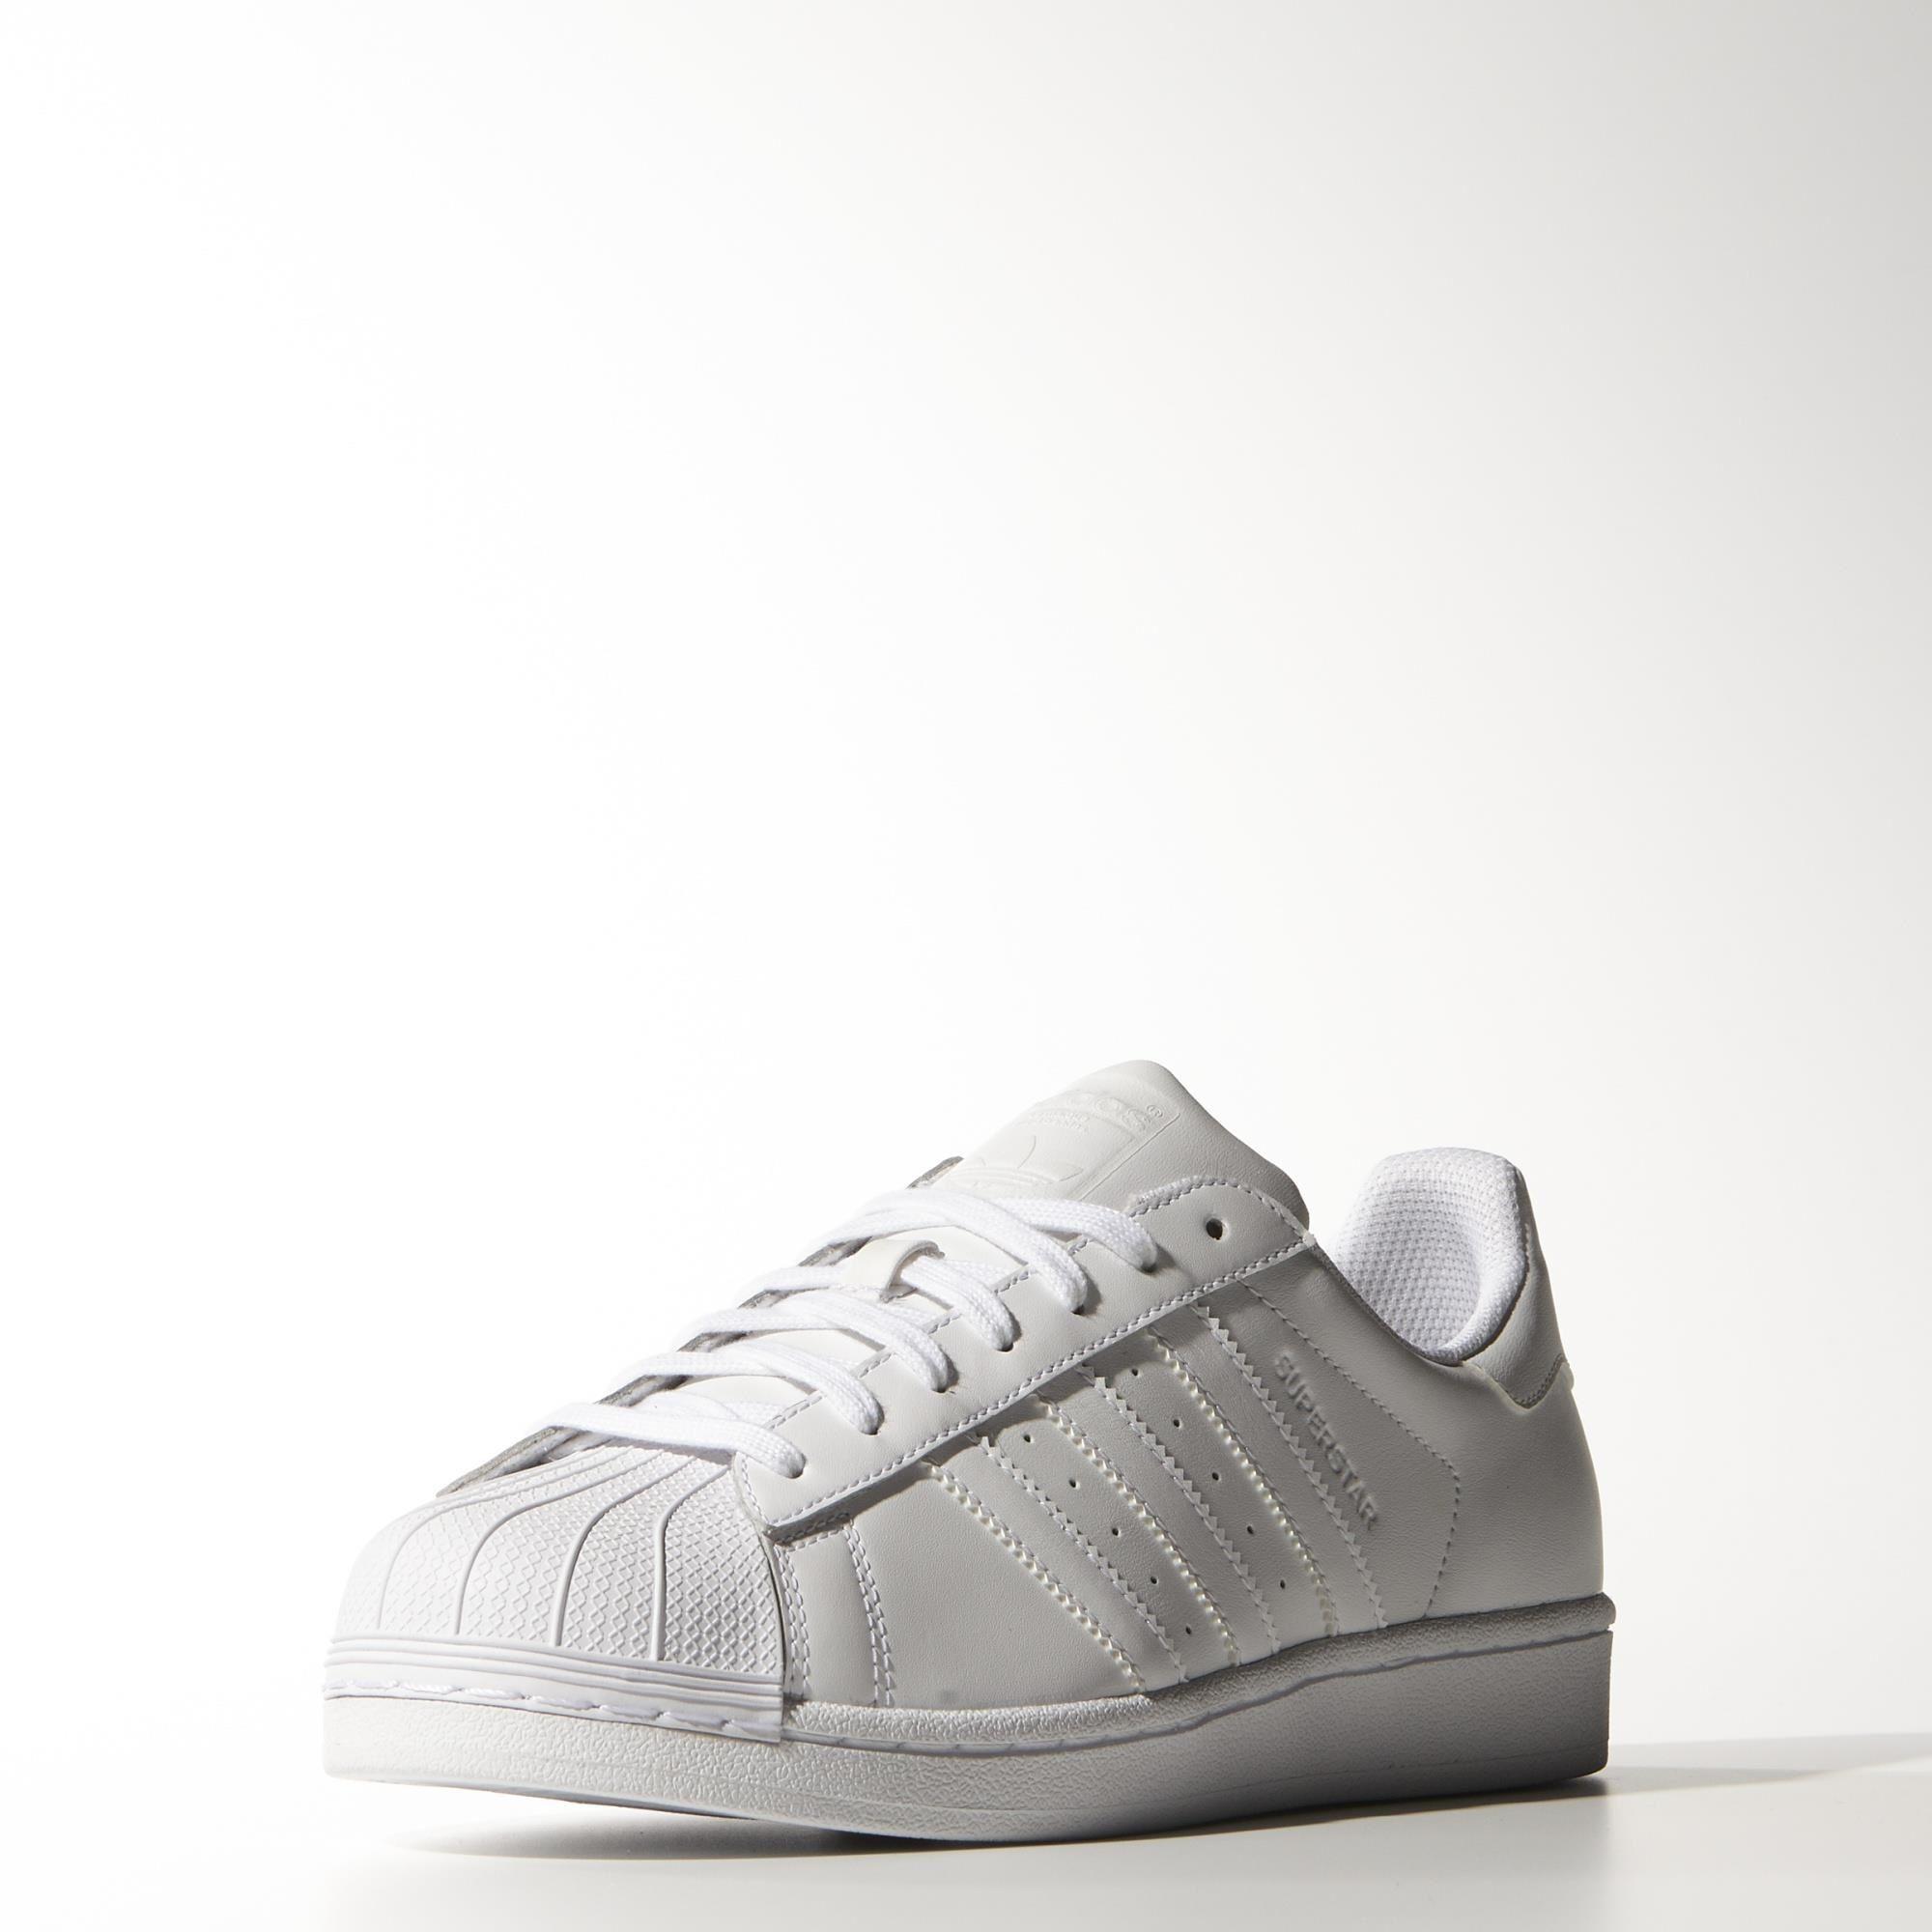 adidas superstar fondazione scarpe bianche adidas australia figo